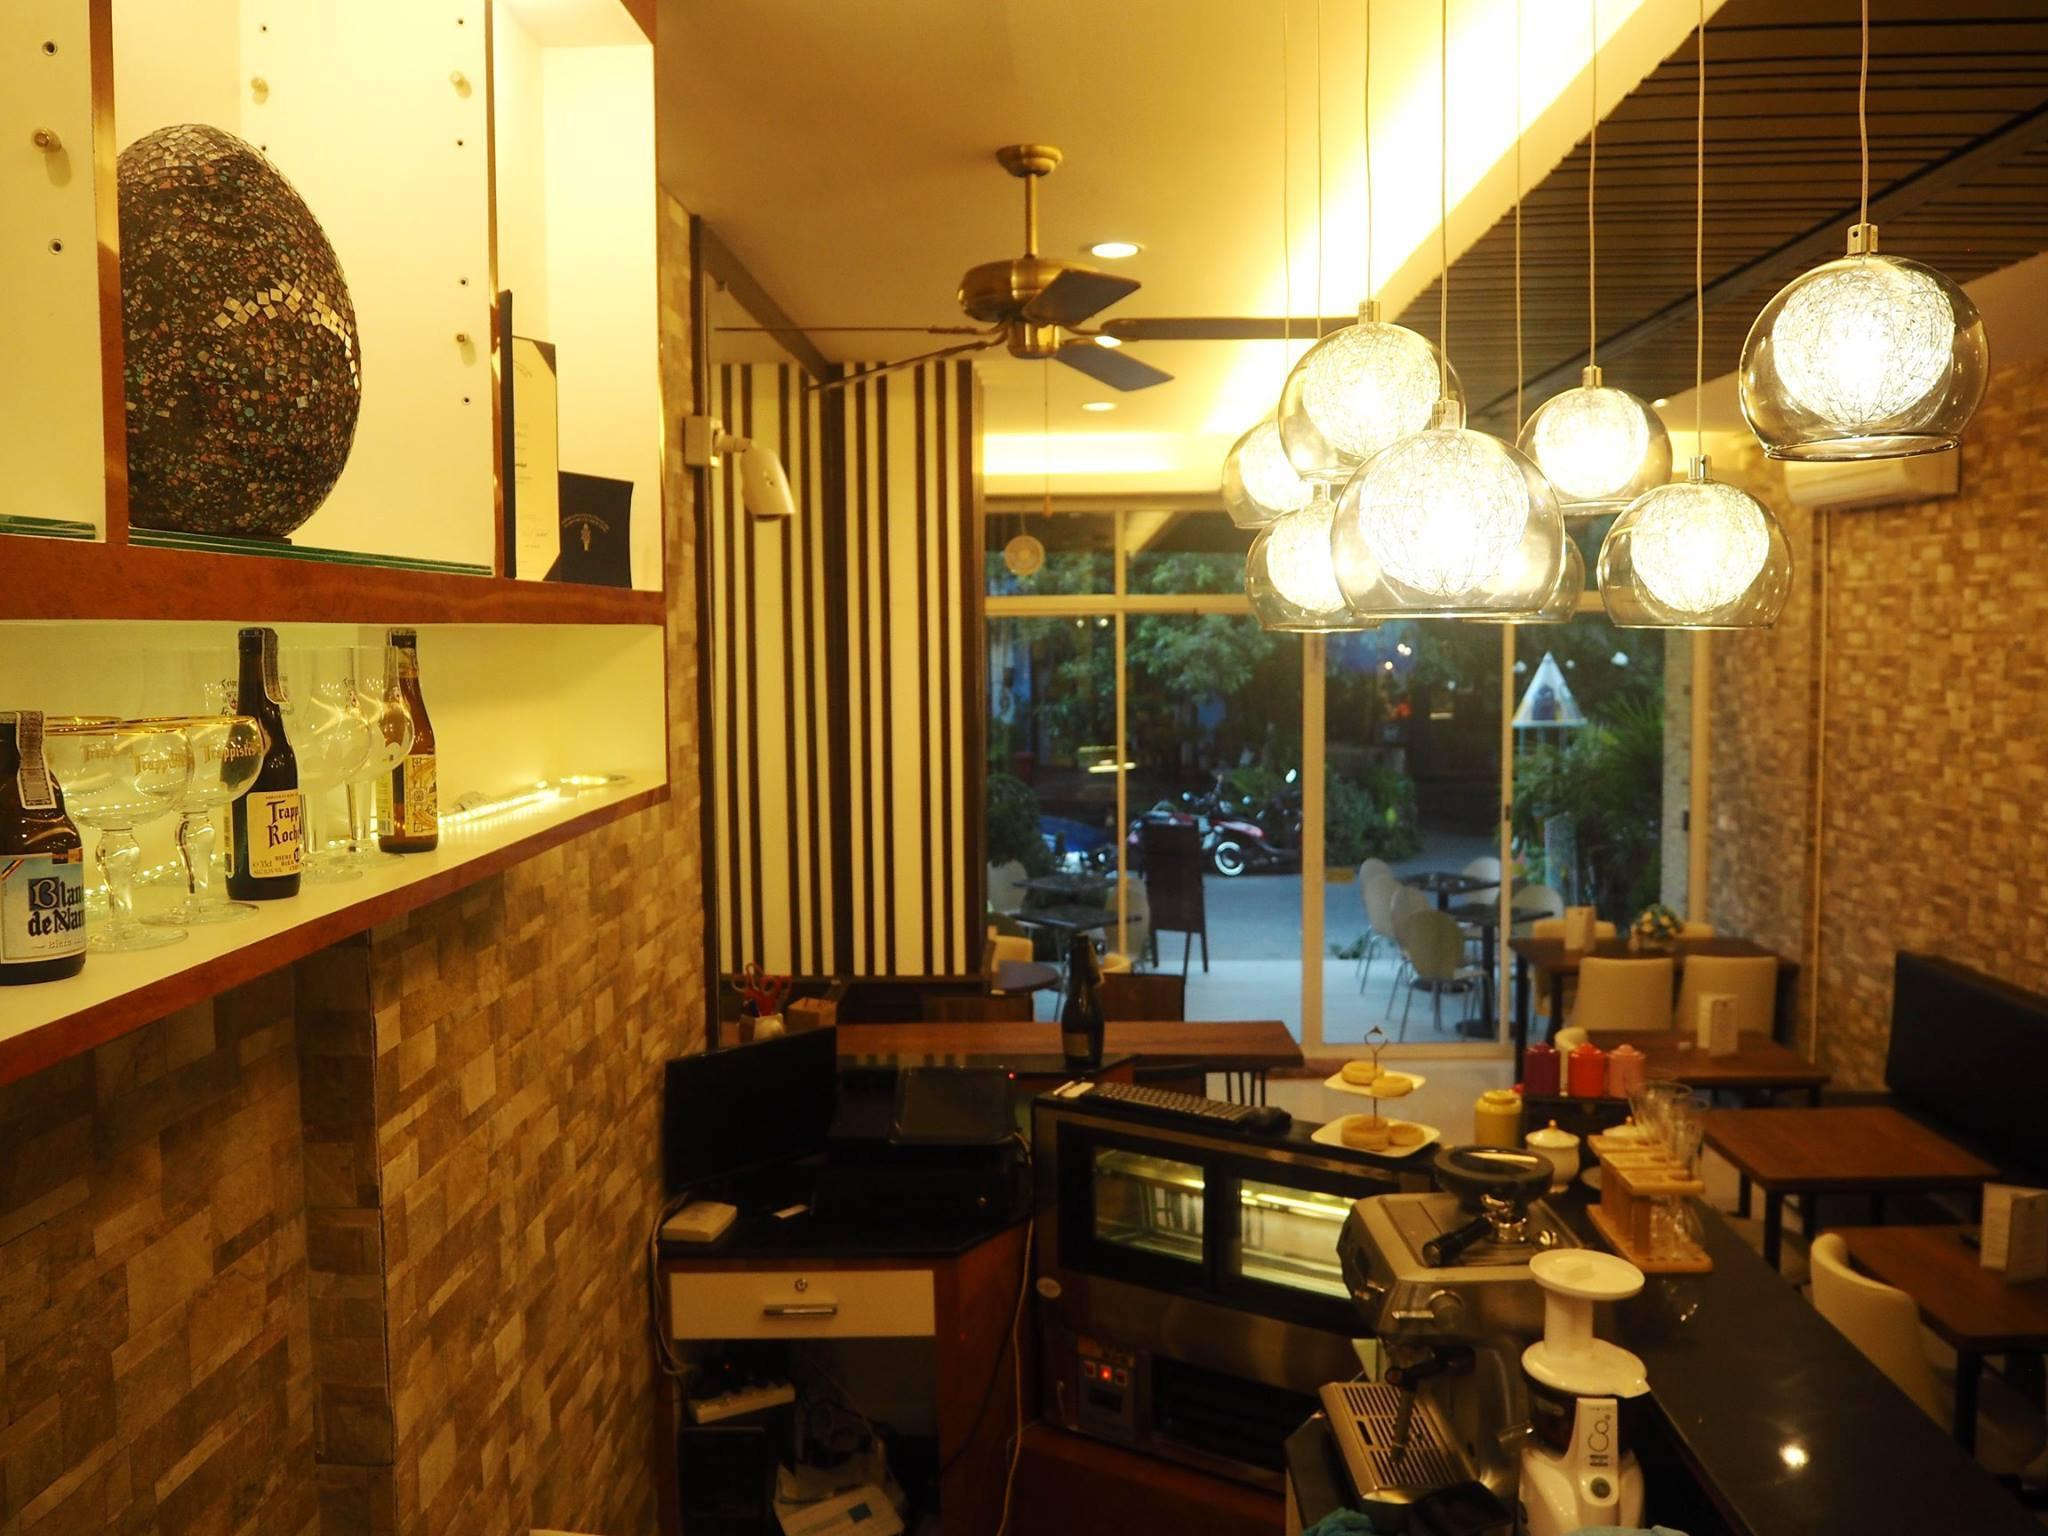 3 Bedrooms Entire Home @ Hip Street Nimman